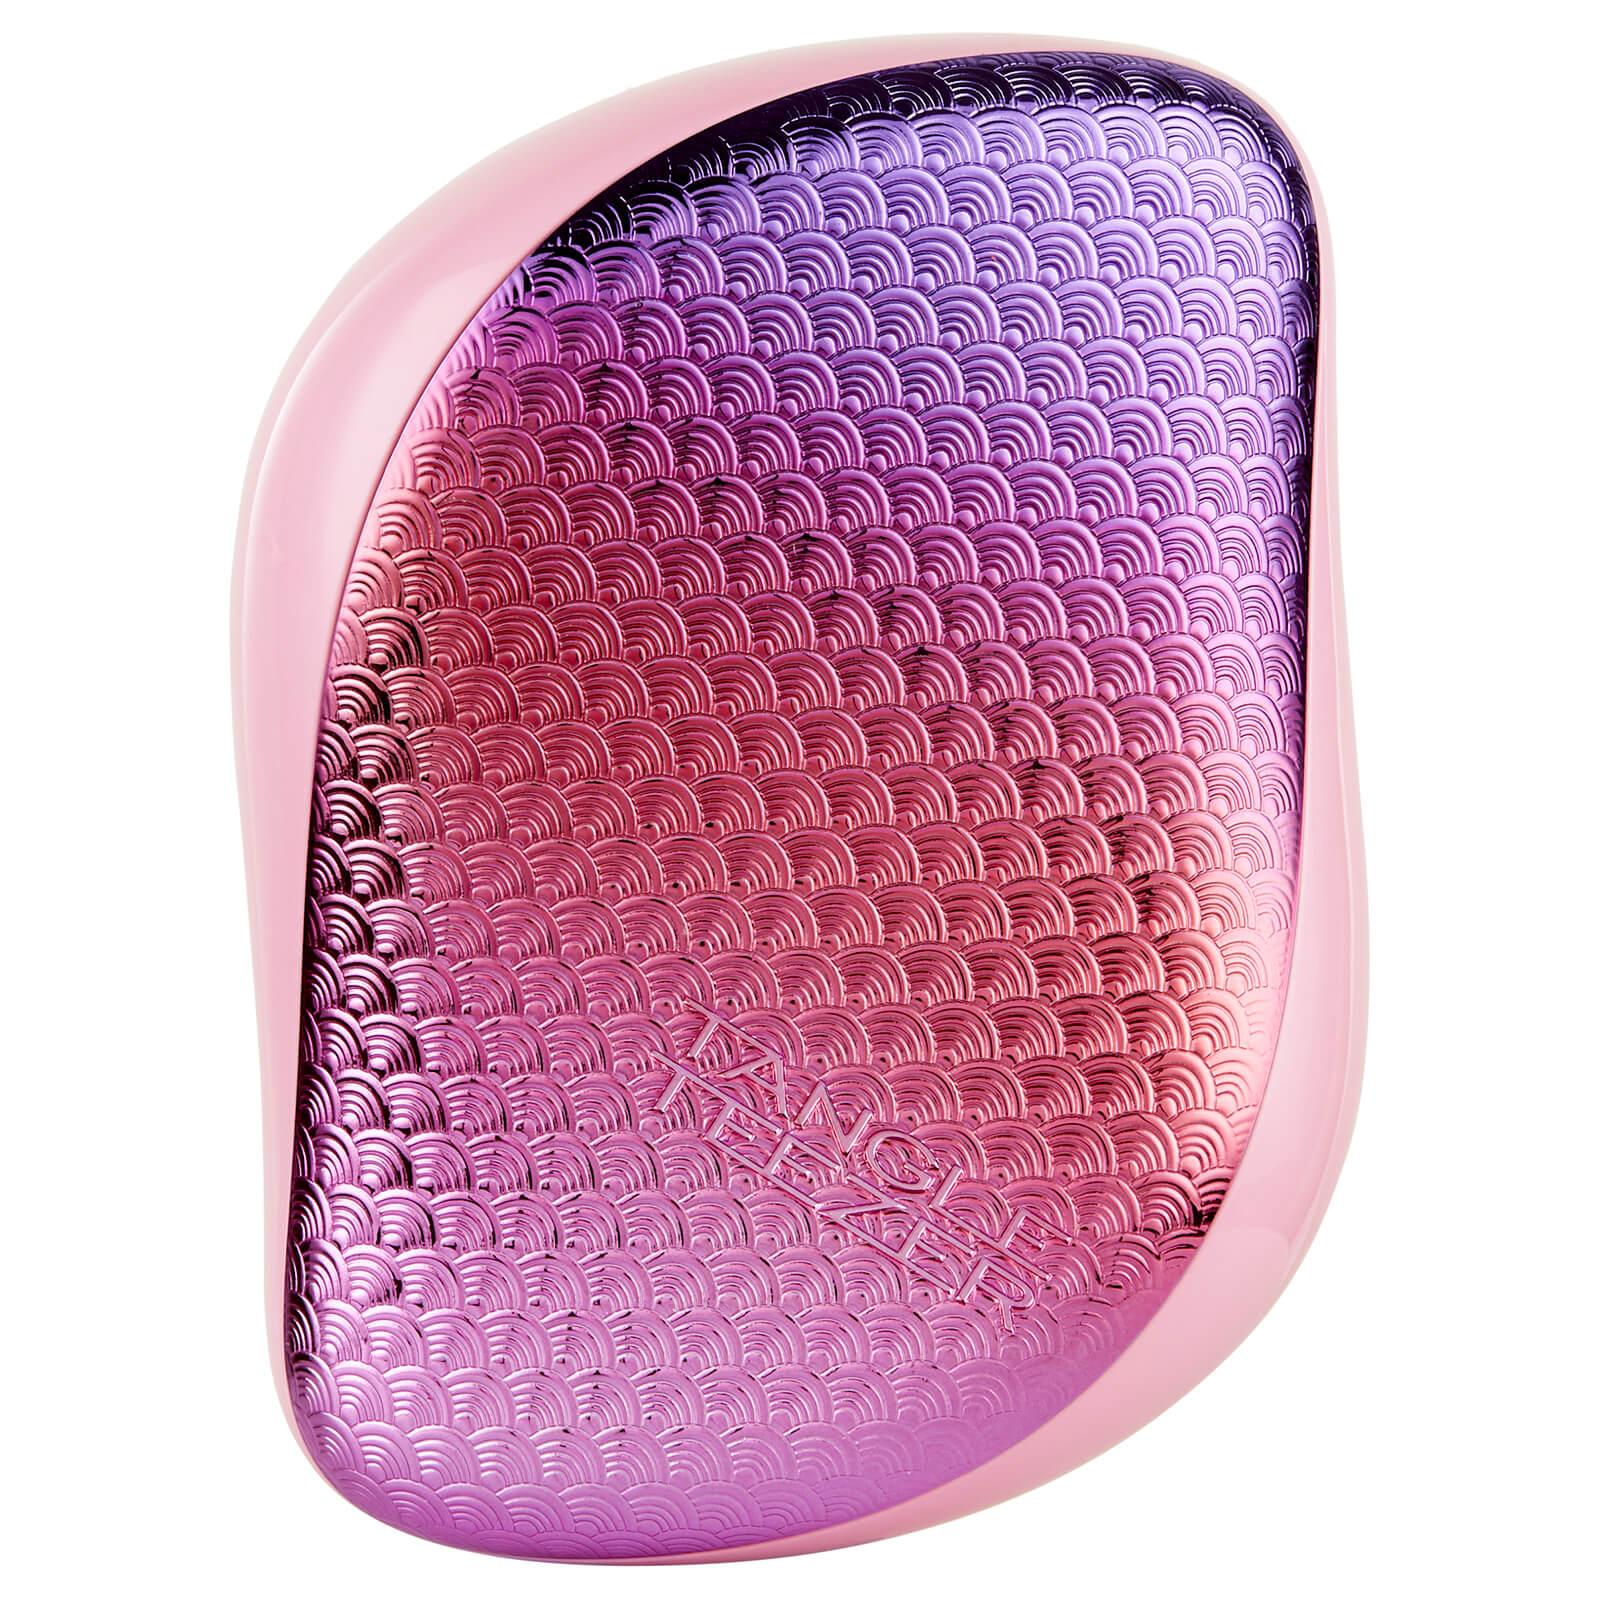 Tangle Teezer Compact Styler Hairbrush - Sunset Pink